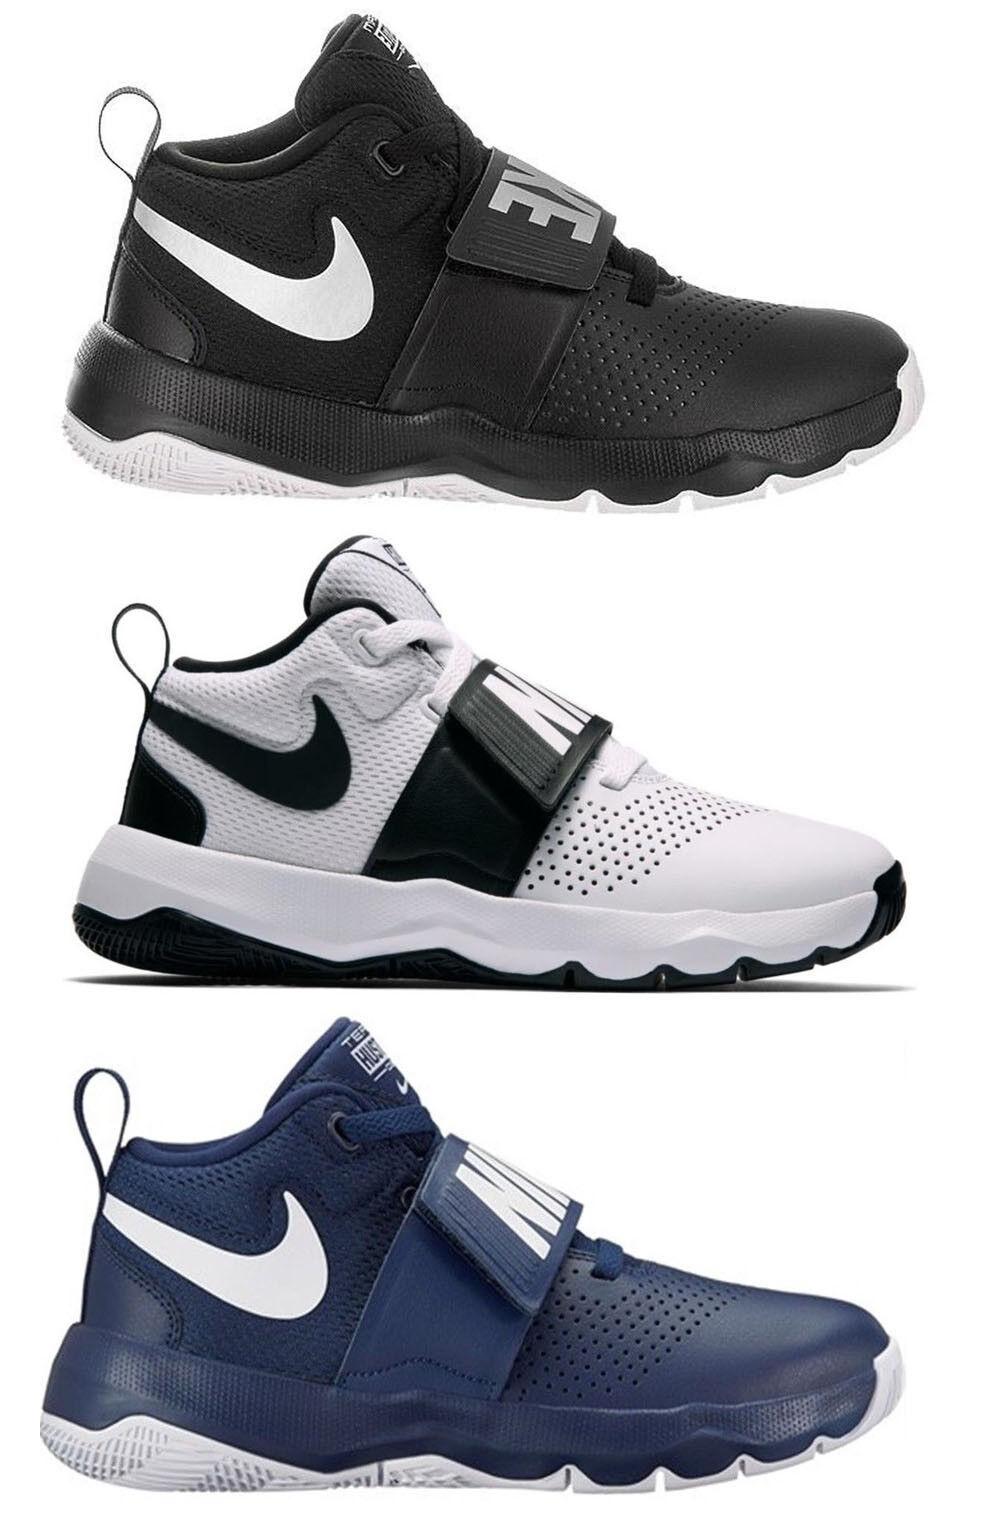 Nike Team Hustle D8 GS skor pojkar herr kvinnor Basketball springaning läder